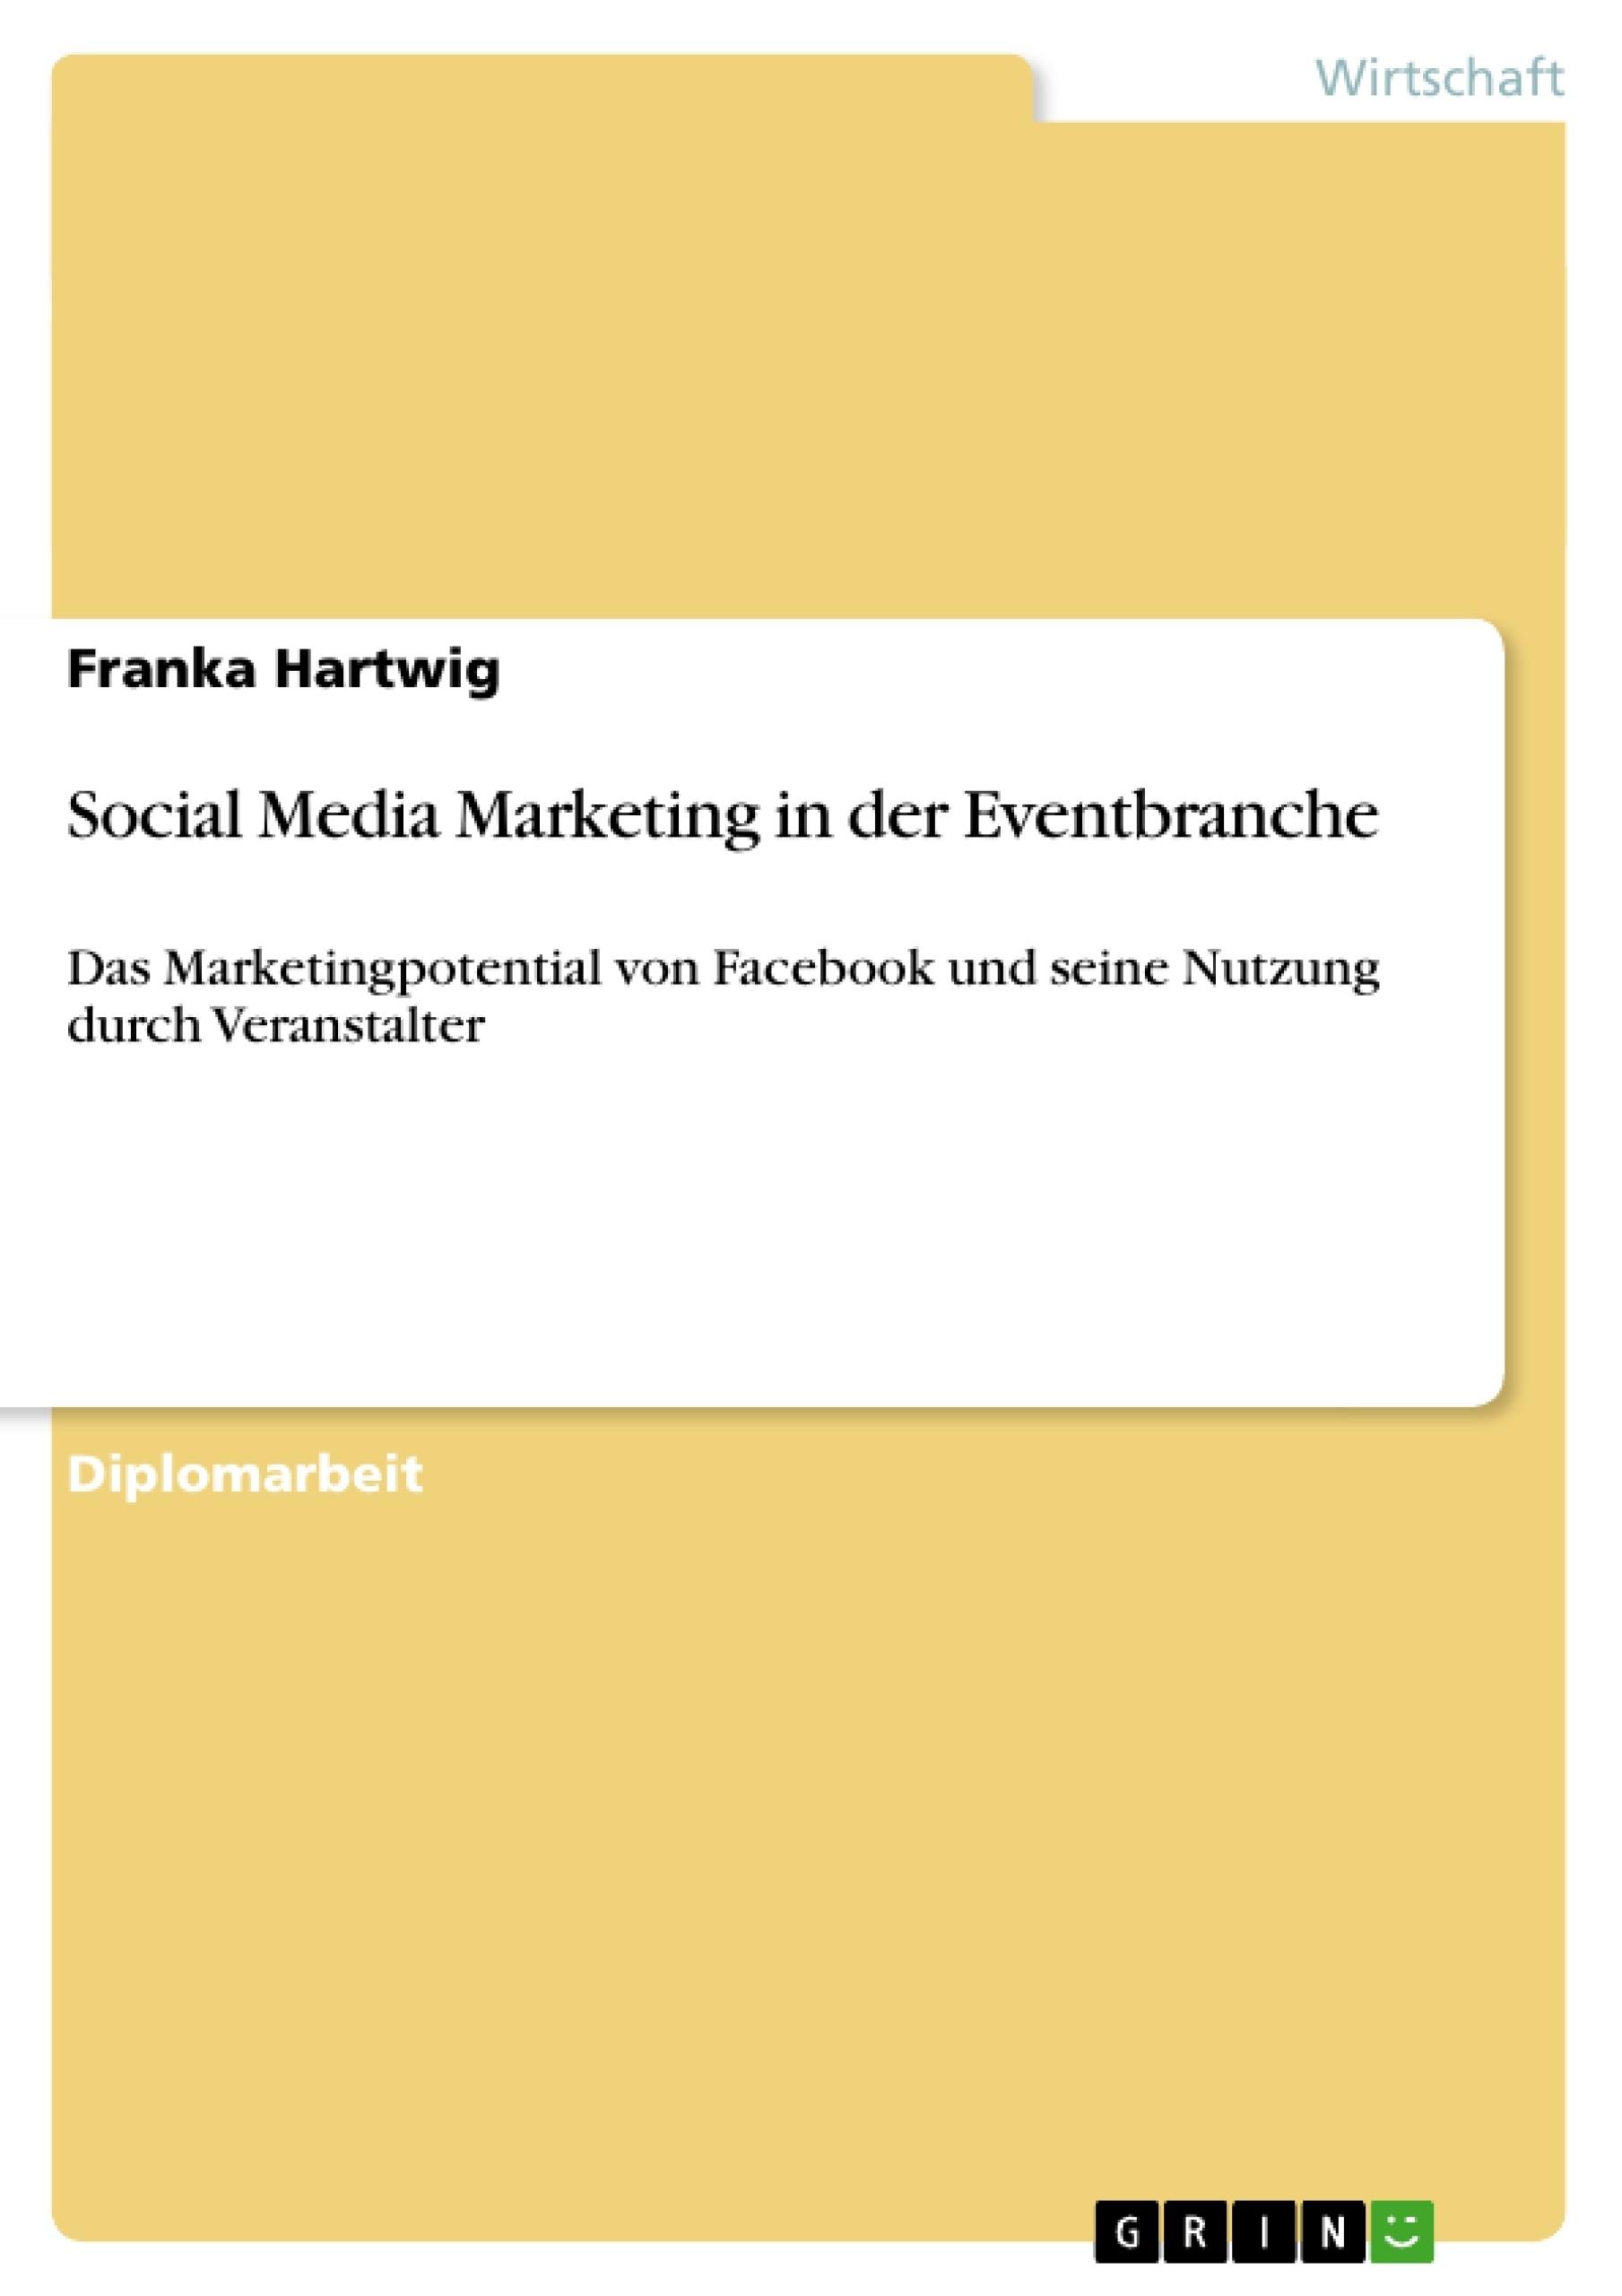 Titel: Social Media Marketing in der Eventbranche